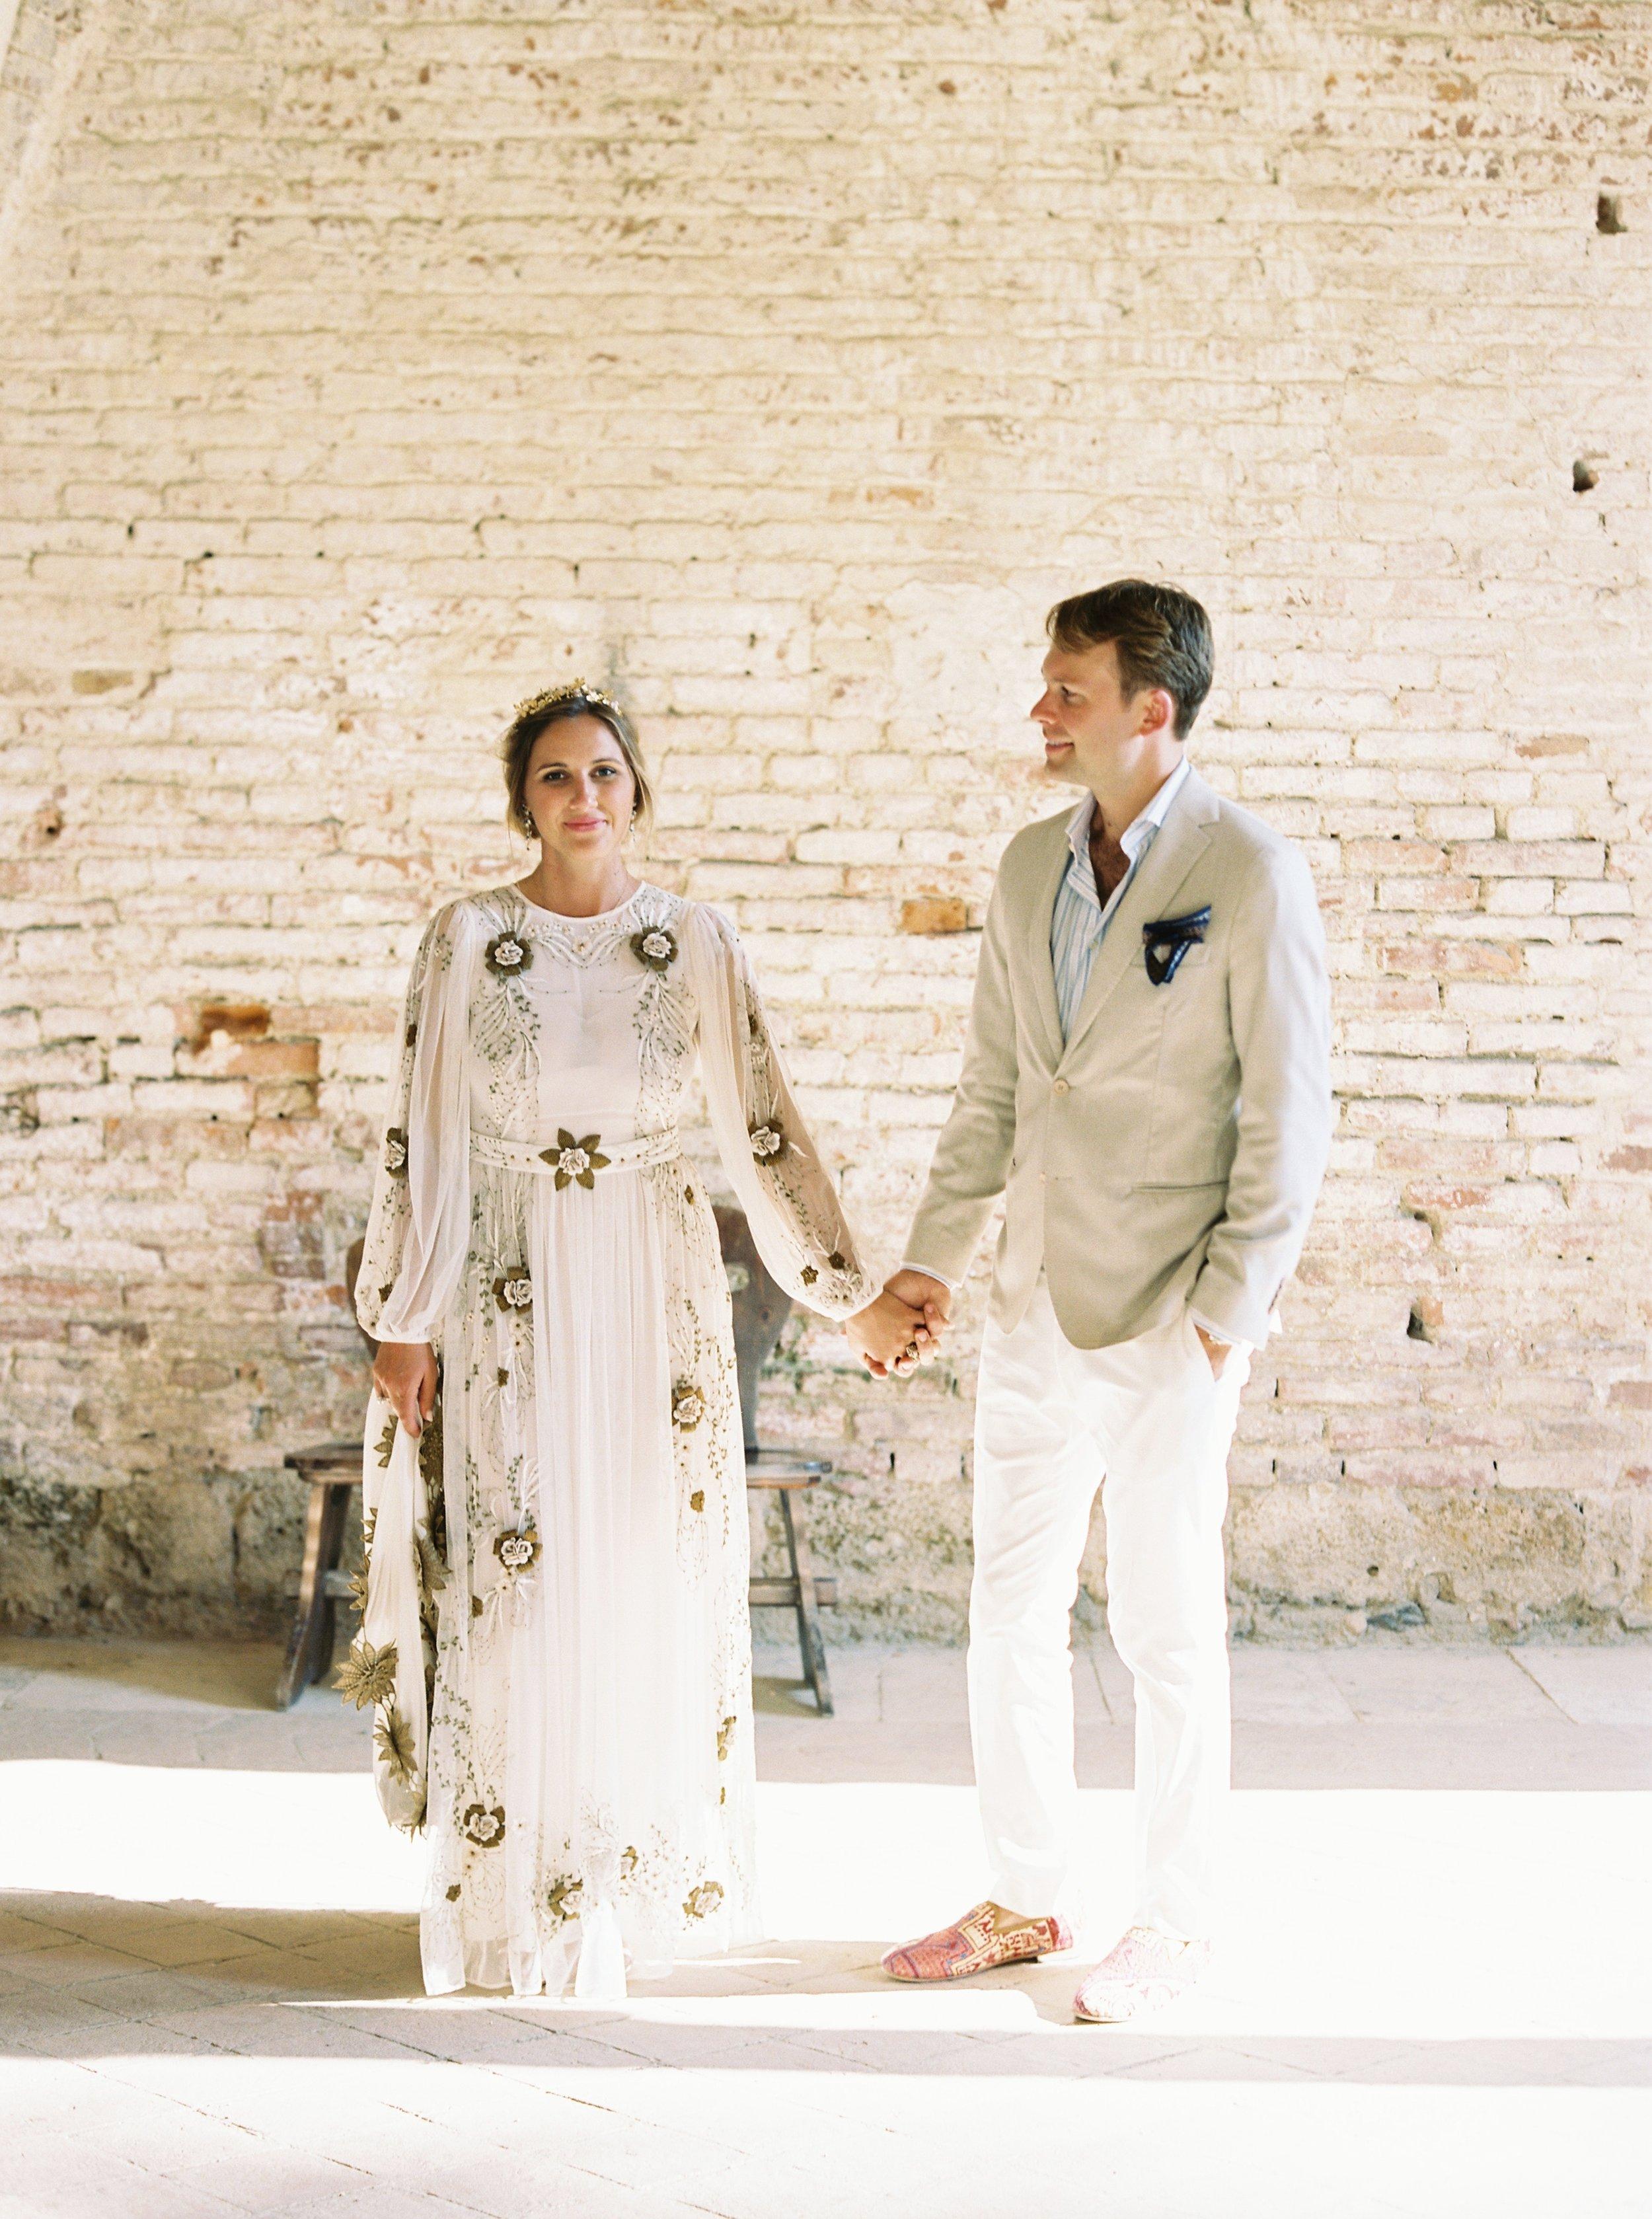 Kyle John l Fine Art Wedding Photography l Chicago, Copenhagen, California, New York, Destination l Blog l Alexis and Zach_Borgo Santo Pietro_Italy_Tuscany_58